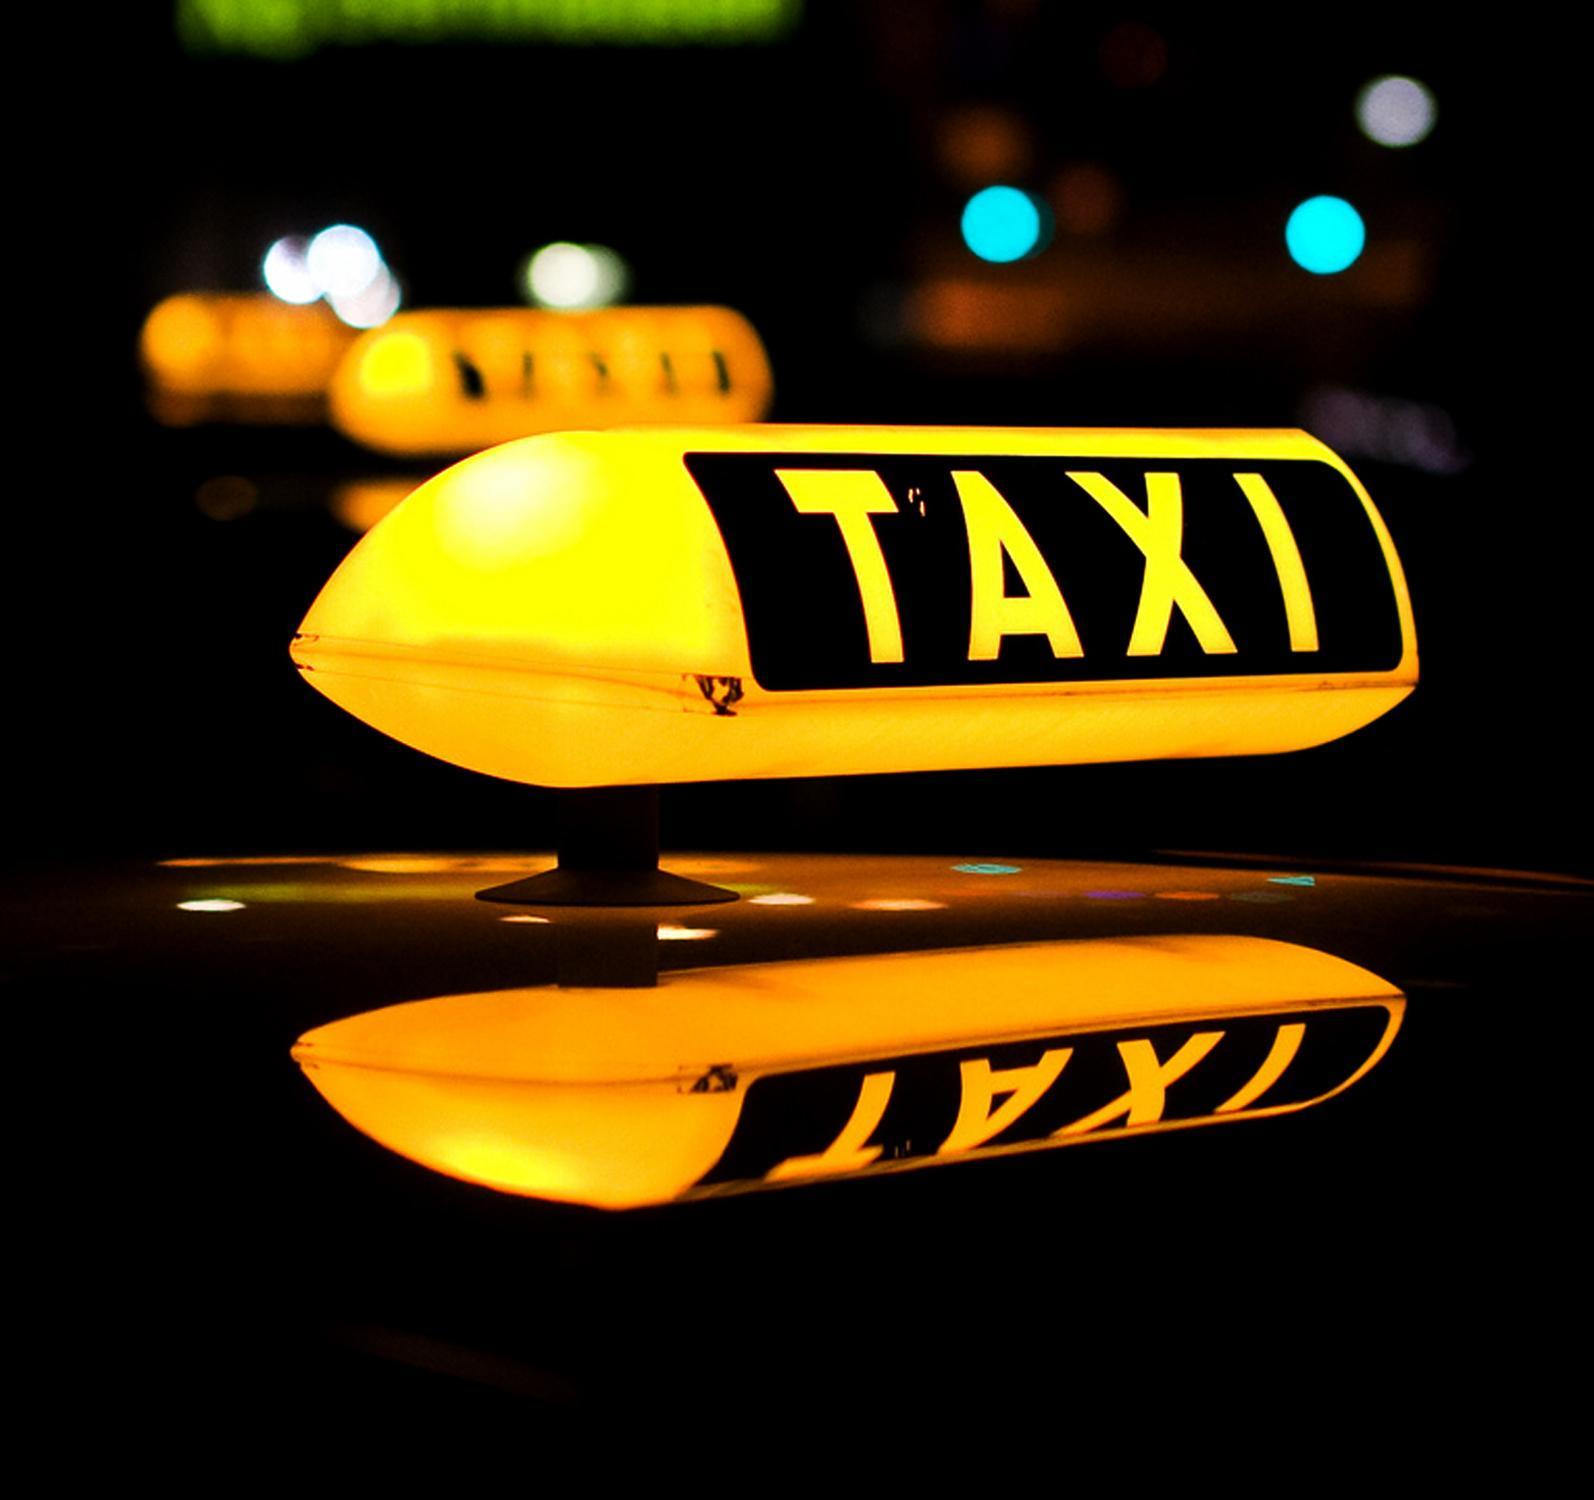 тротуарной картинка такси конфеты рецепты сайт кулинарных